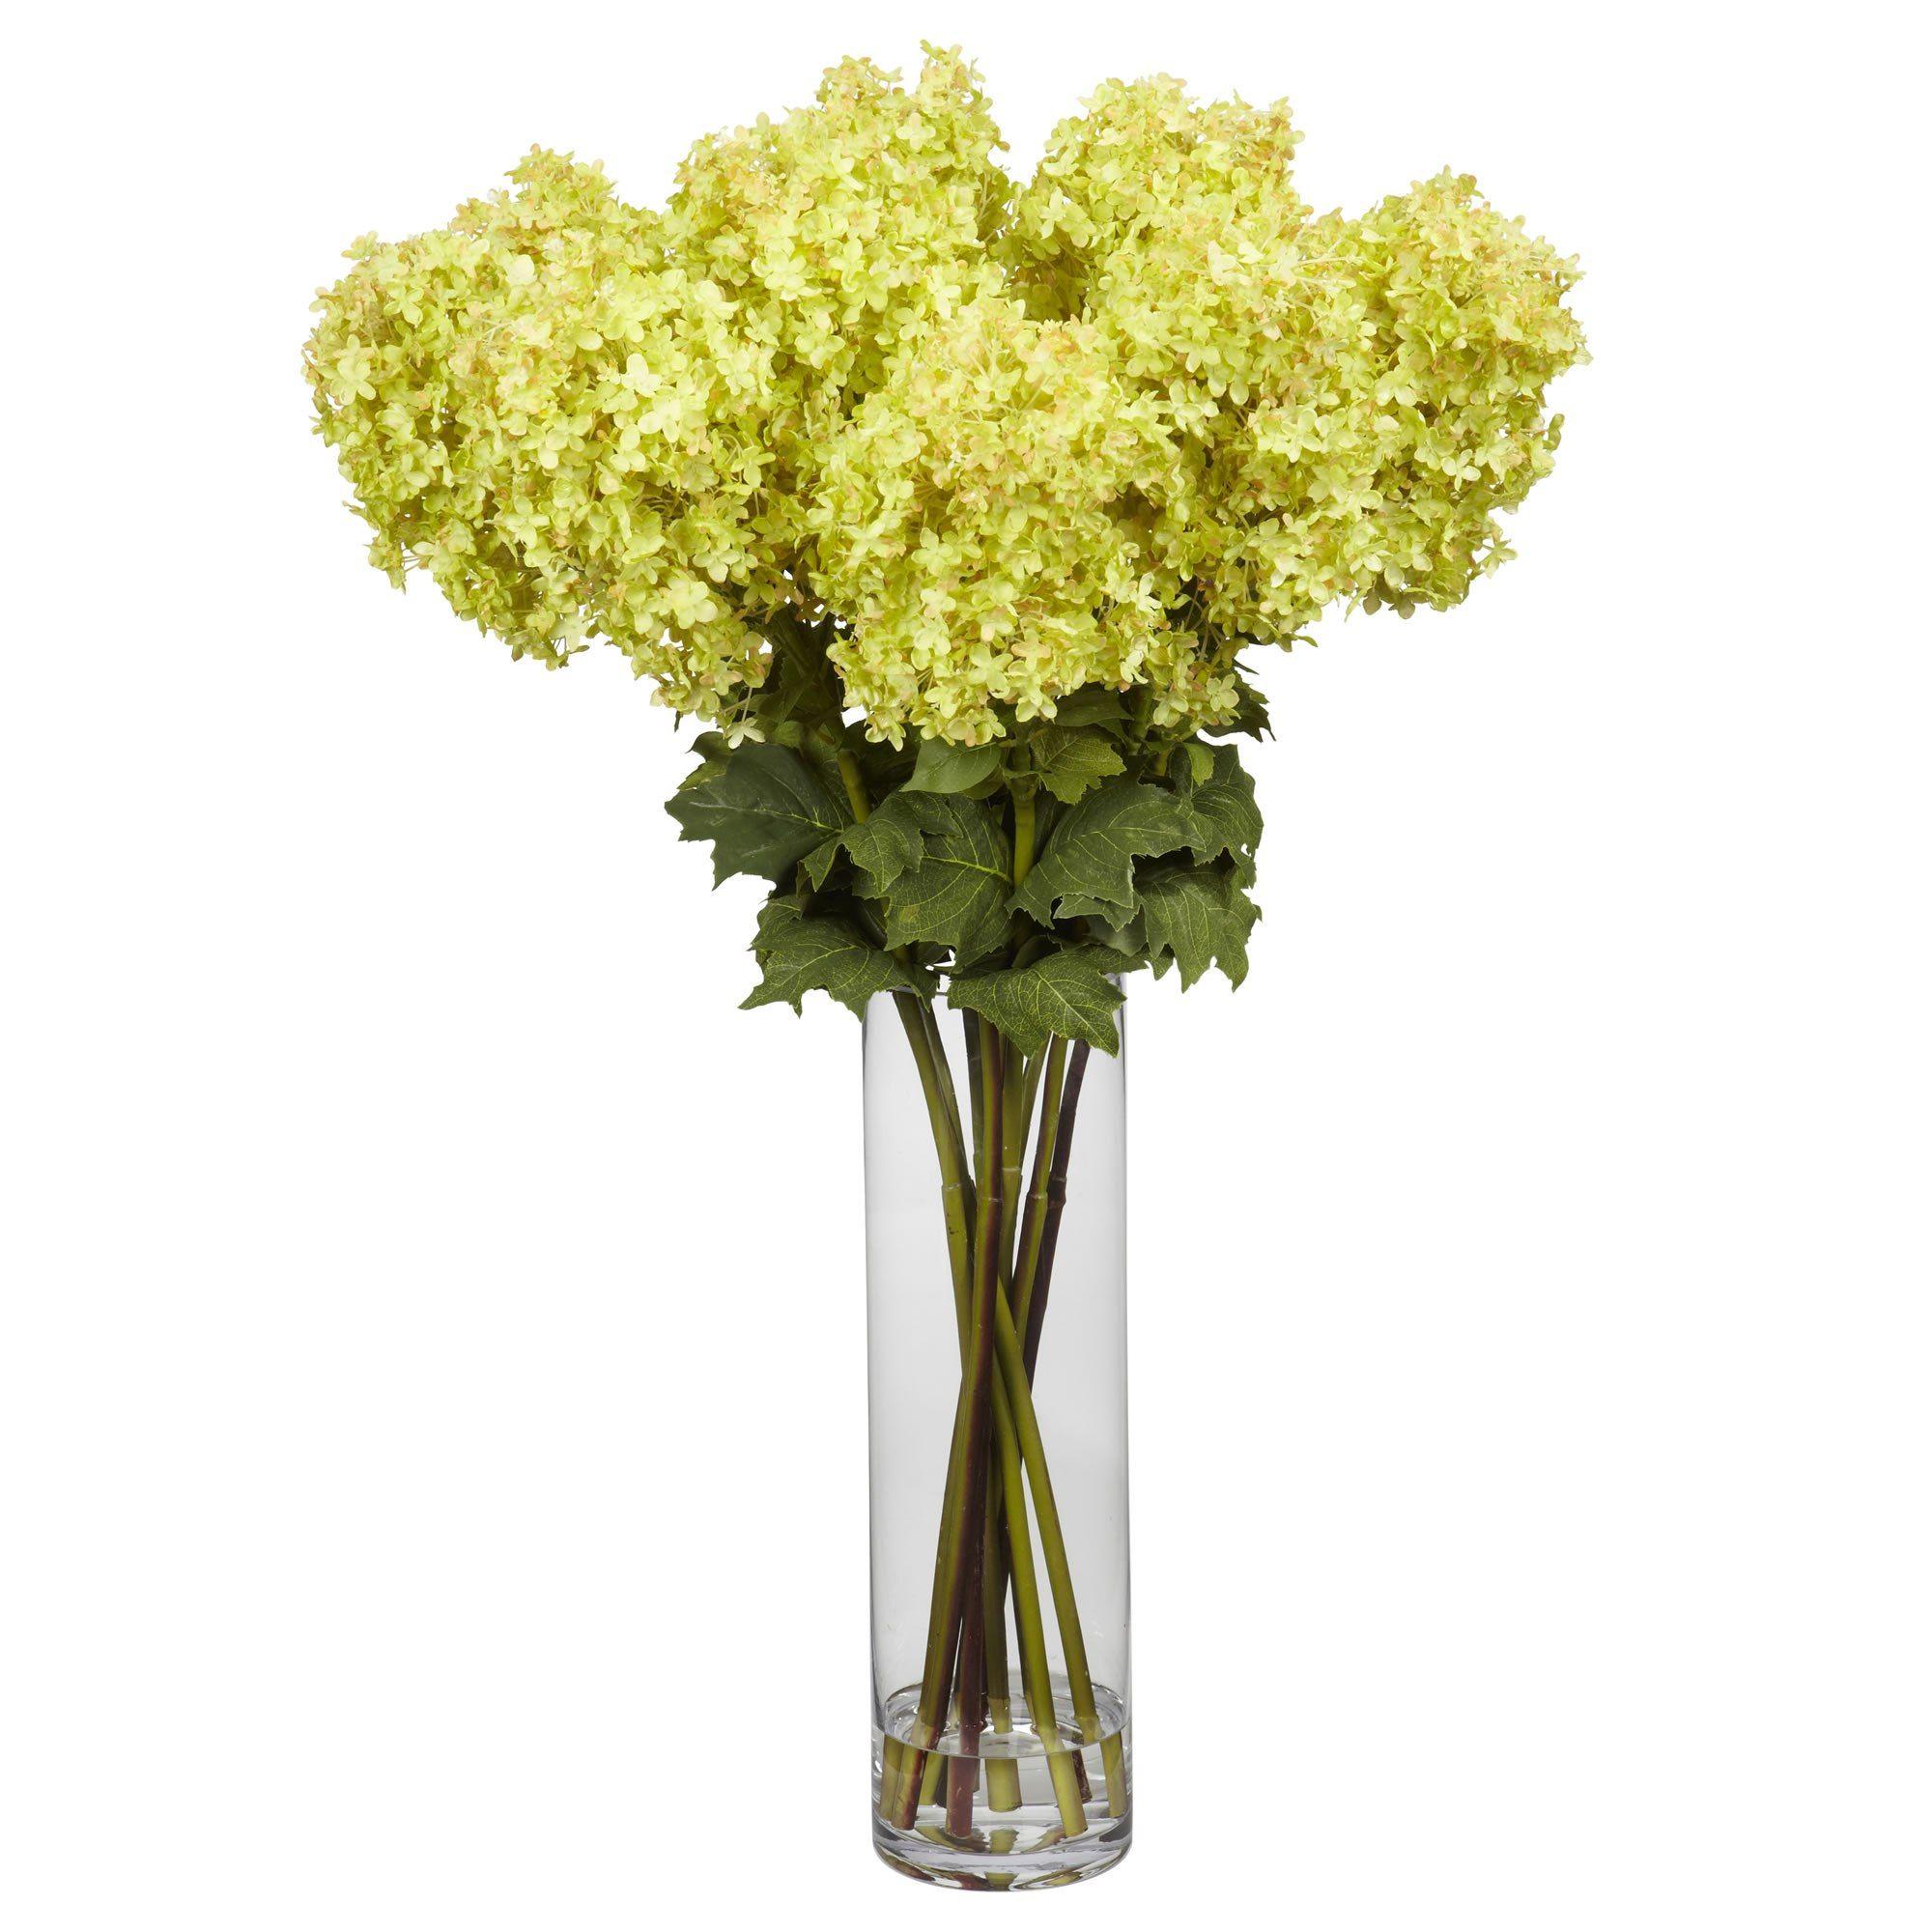 40 H Giant Hydrangea Silk Flower Arrangement Silk Flower Arrangements Hydrangea Arrangements Artificial Flowers